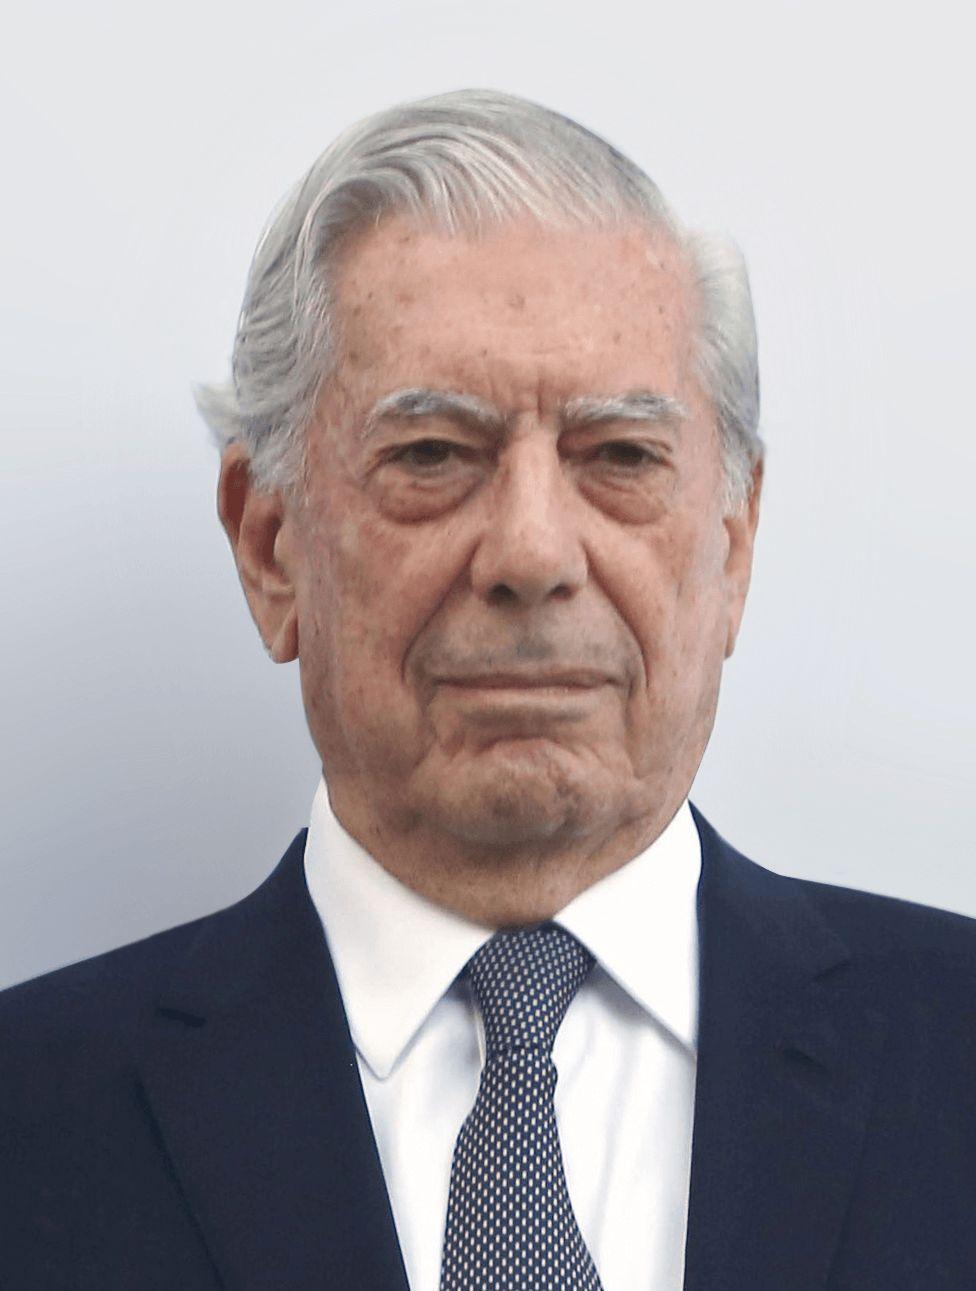 Марио Варгас Льоса